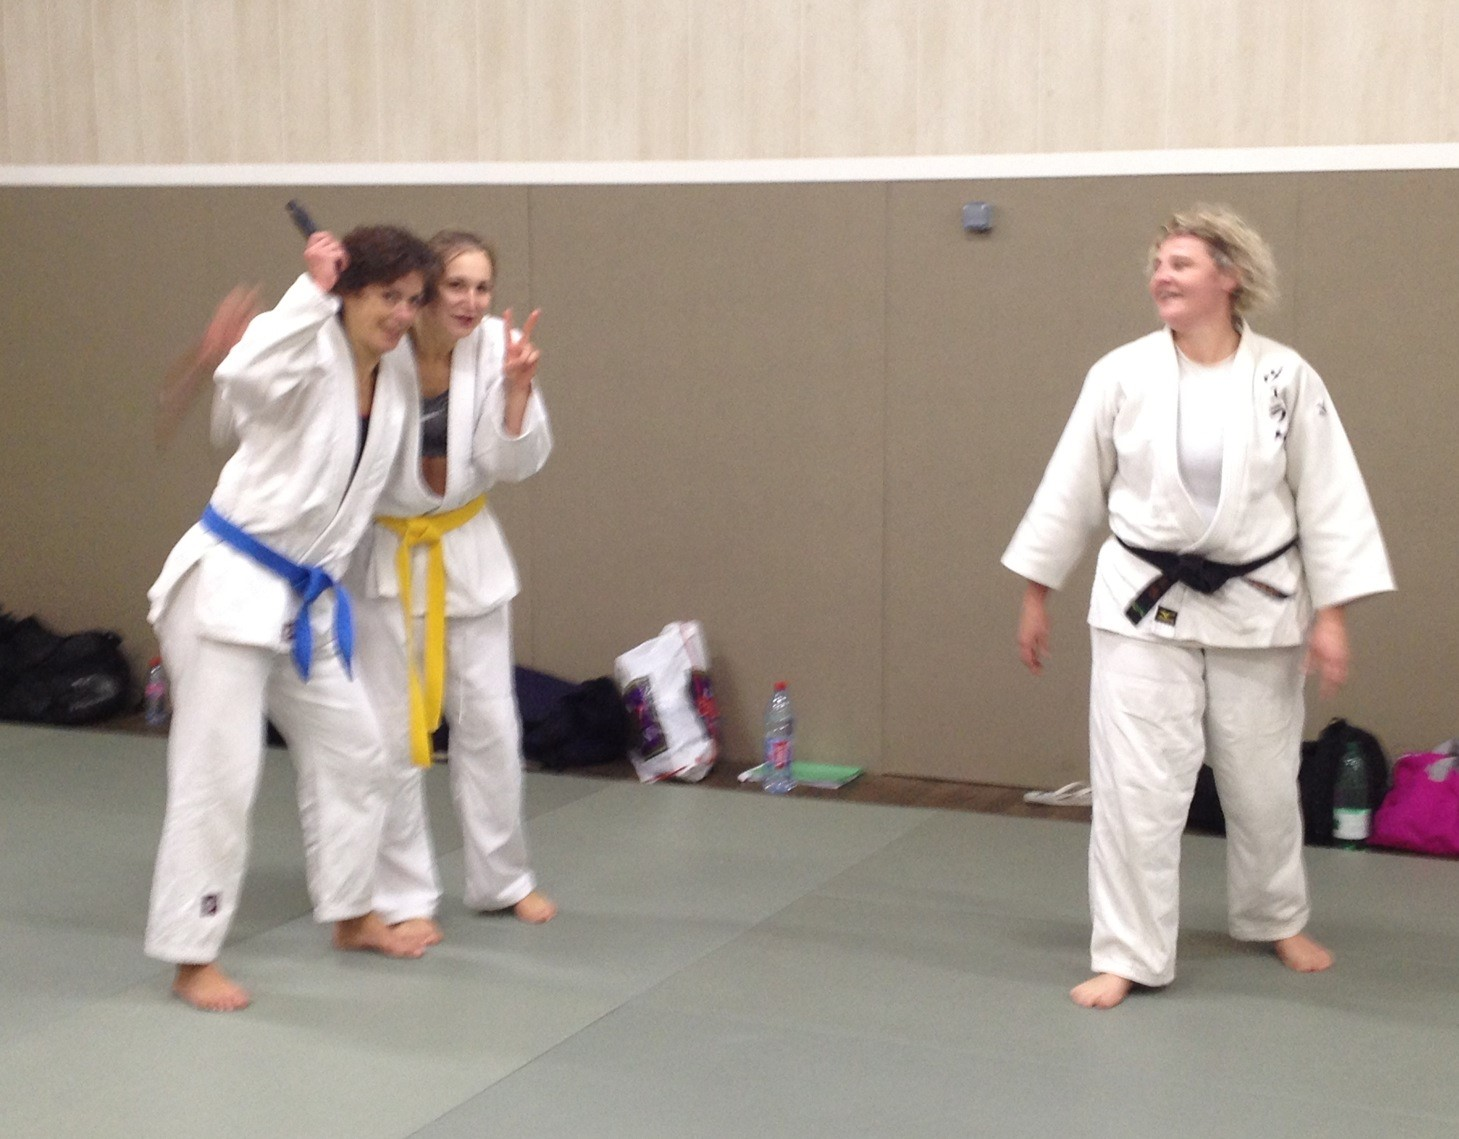 jujitsu-efjjsd-novembre-2013 1